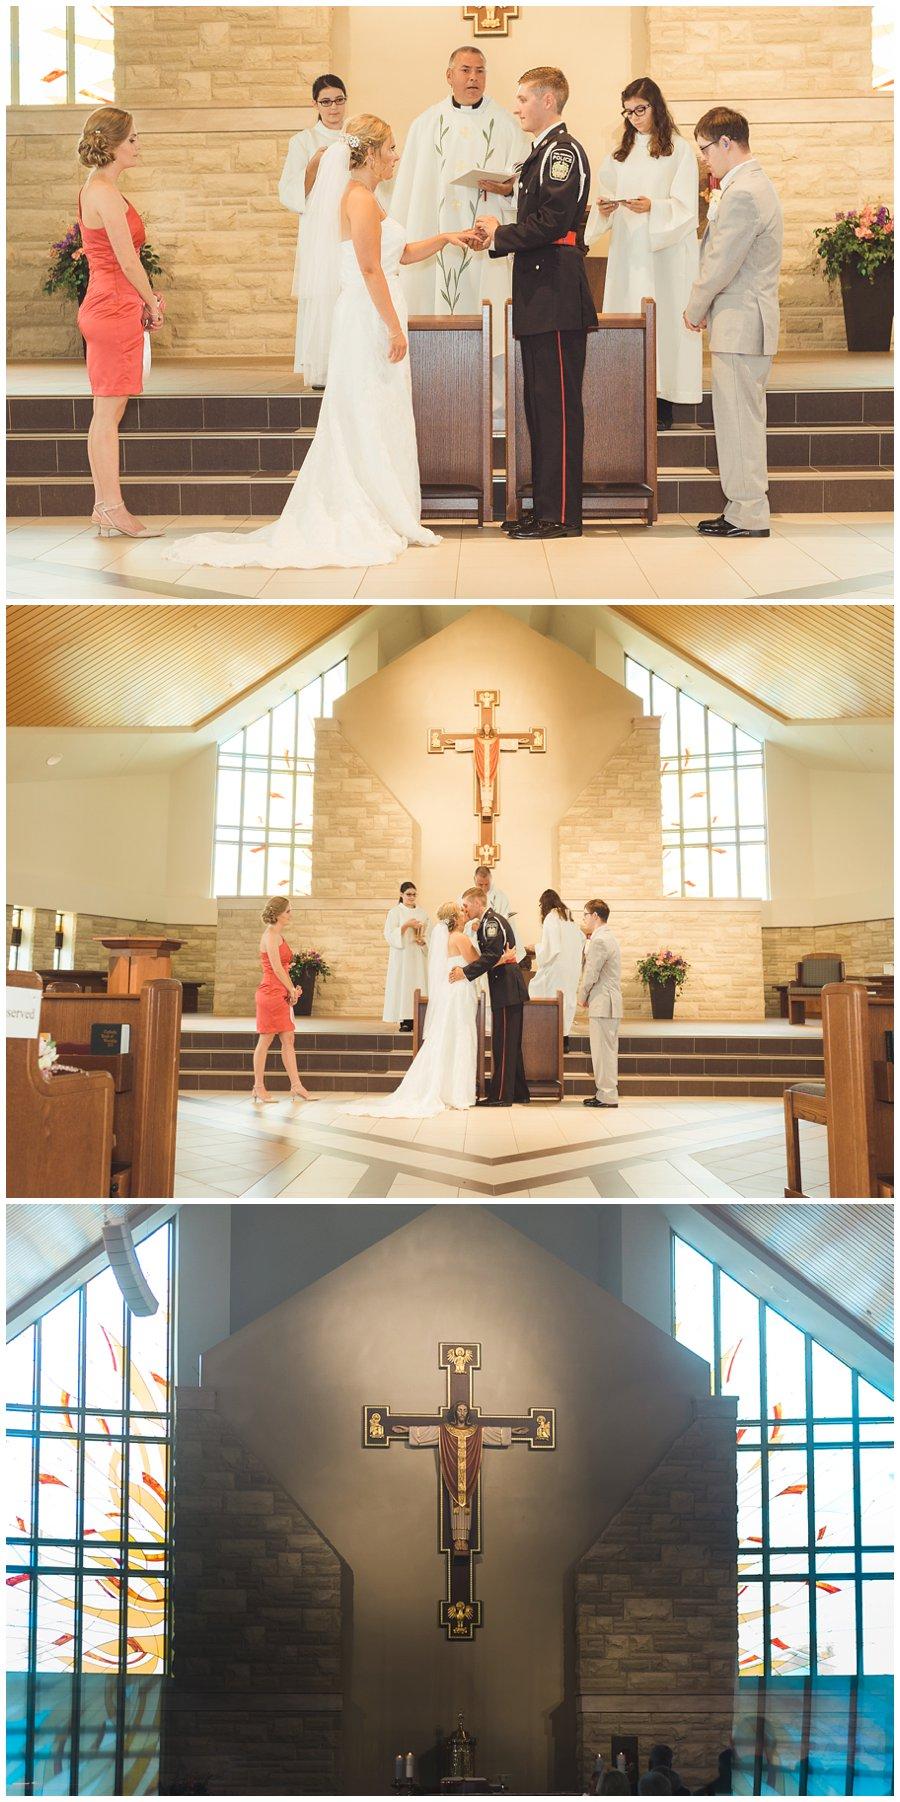 Oakville Harbour Wedding Photography - Love BEe Photography11.jpg